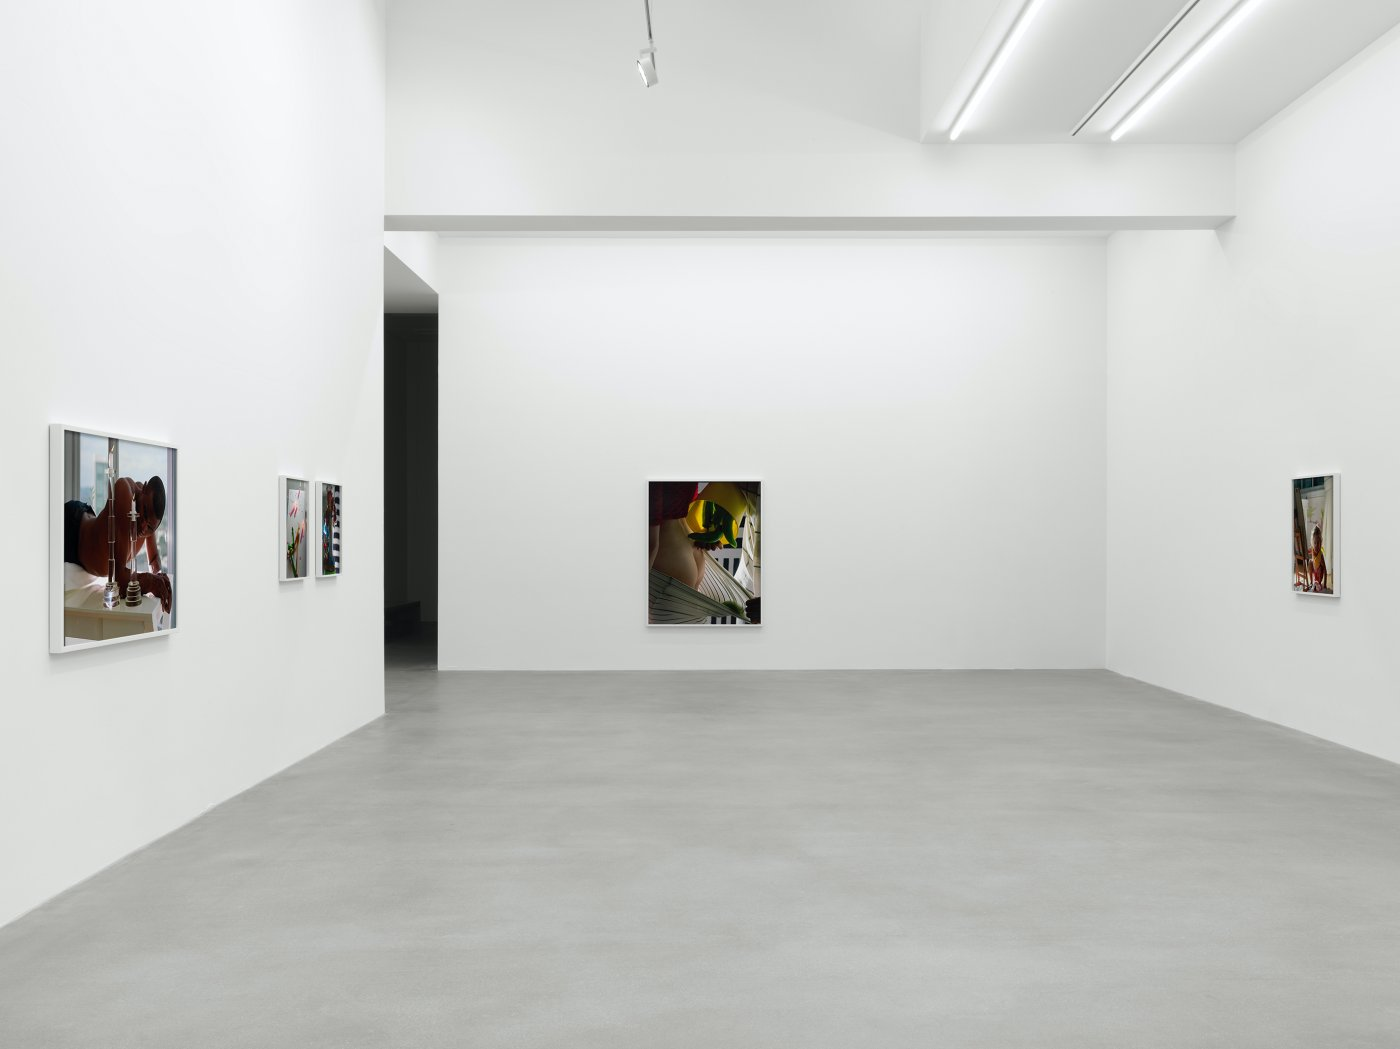 Galerie Eva Presenhuber Waldmanstrasse Torbjorn Rodland 3